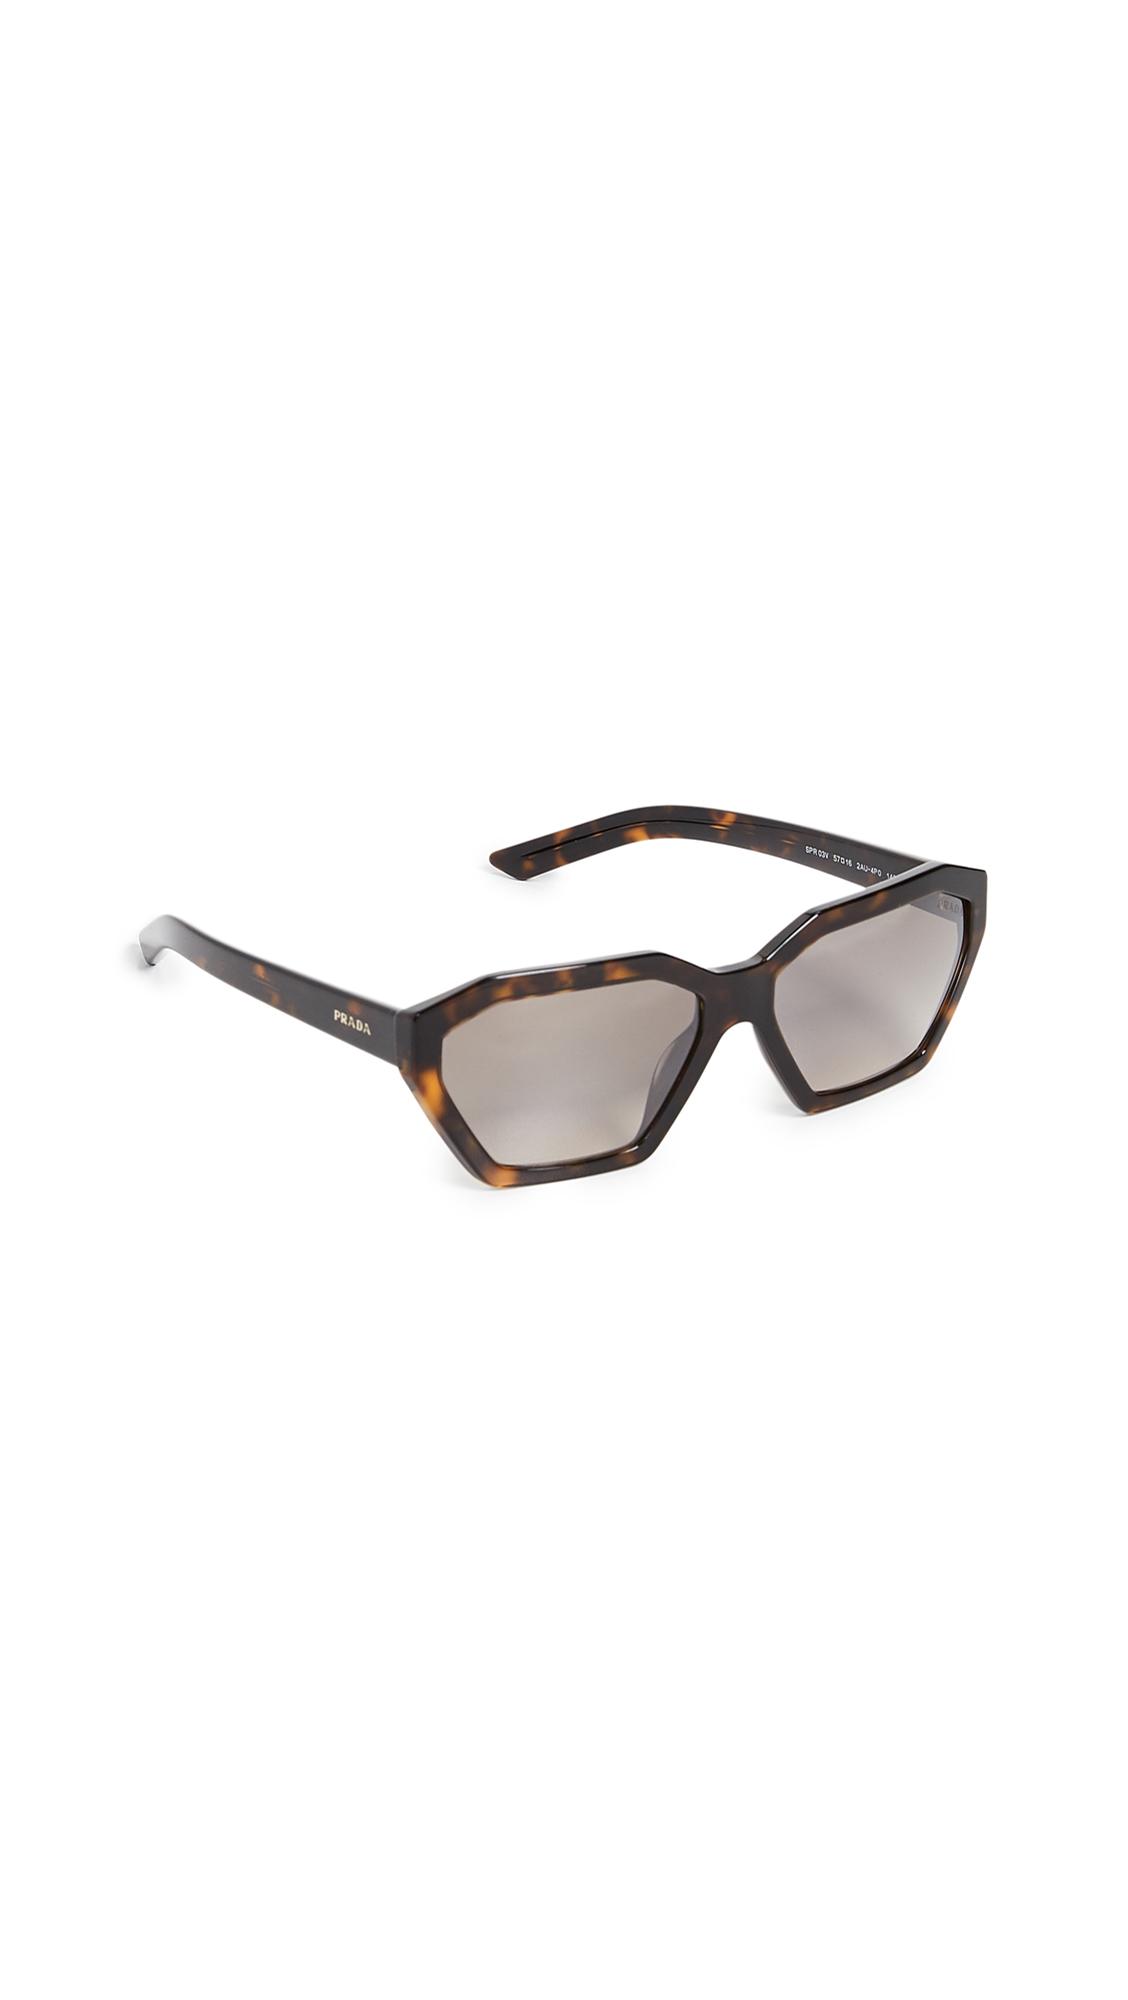 0689aa83ade1 Prada PR 03VS Millennial Geometric Sunglasses | SHOPBOP